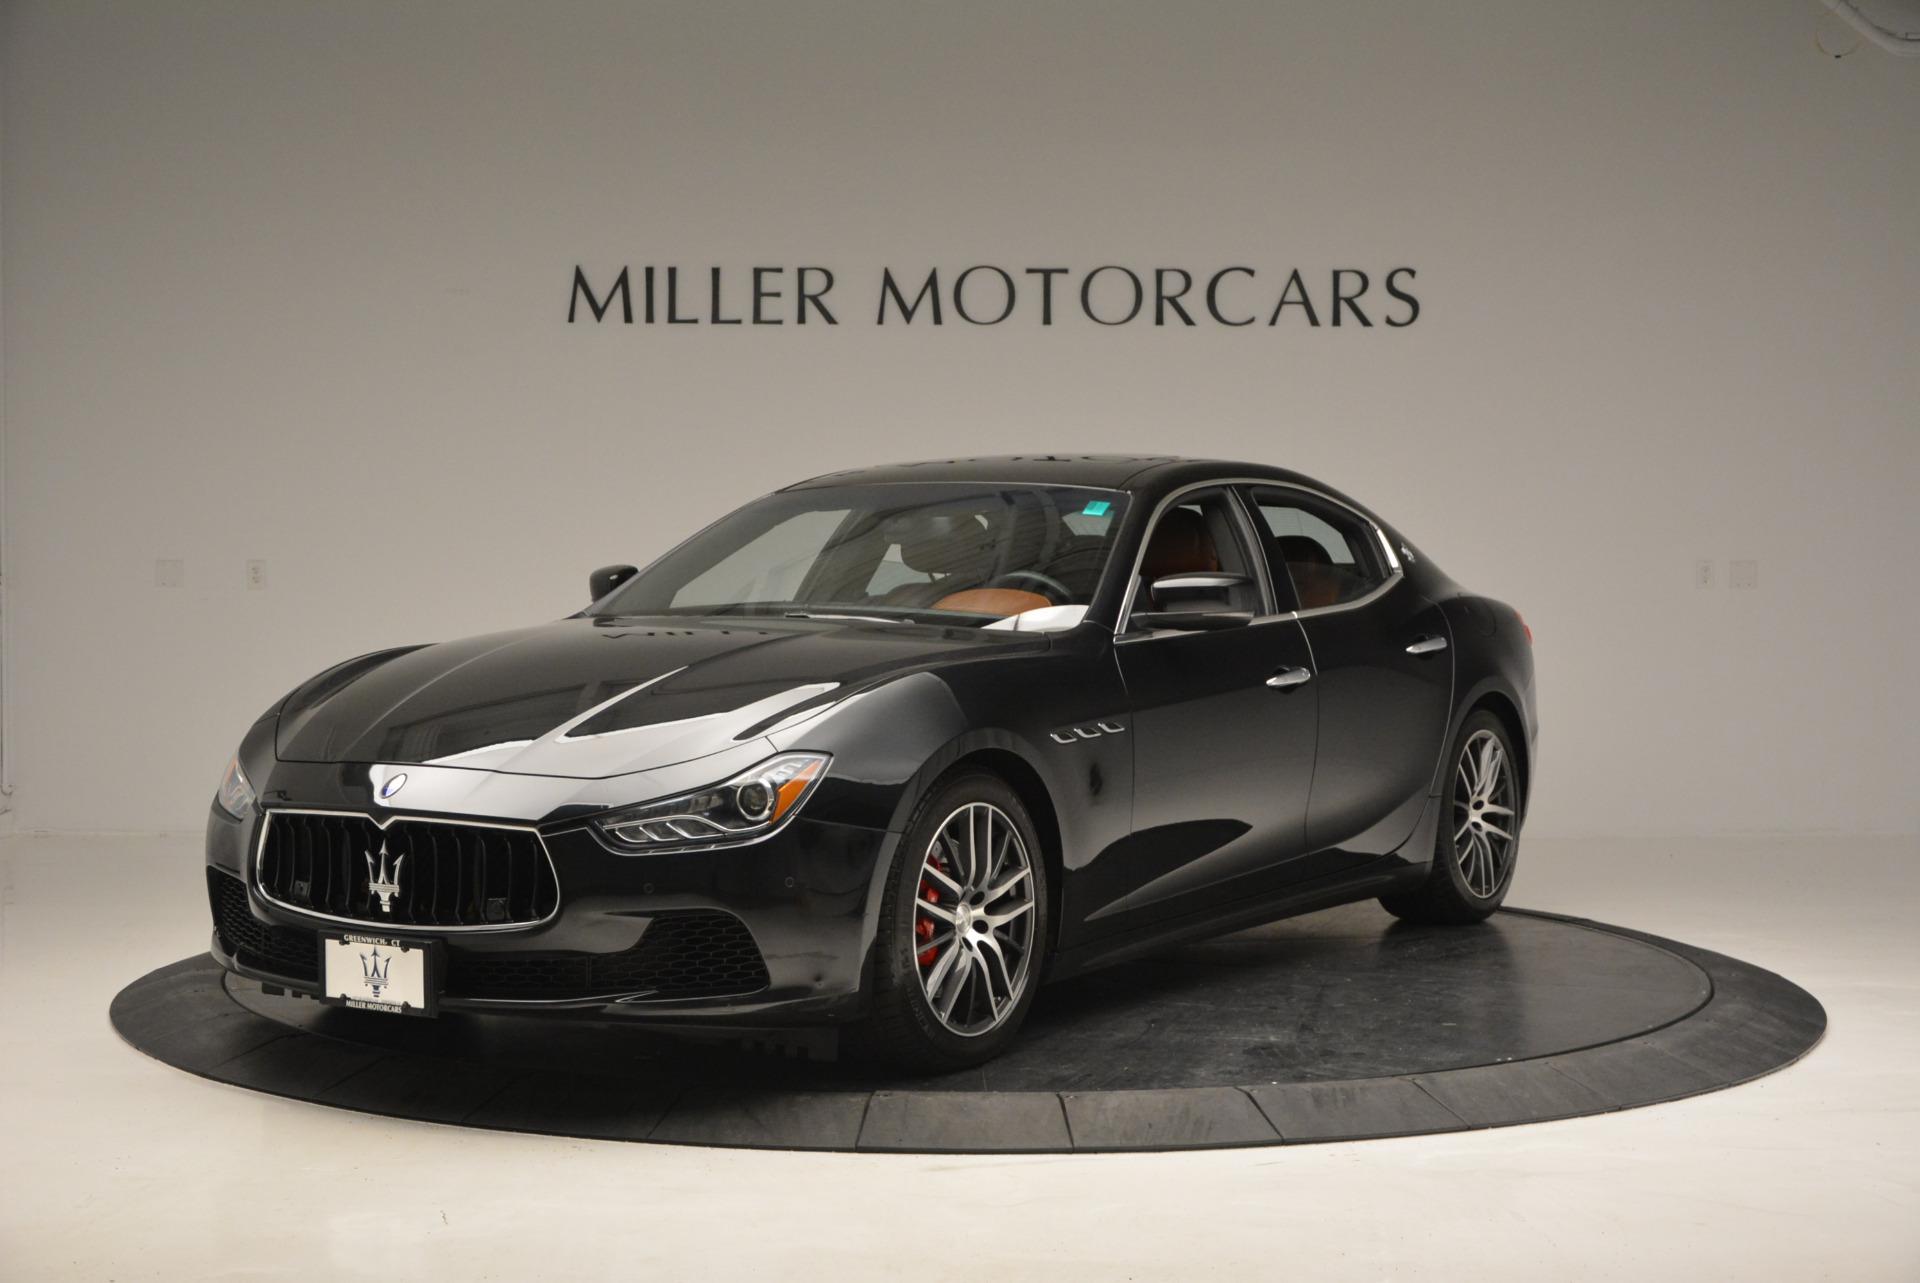 Used 2014 Maserati Ghibli S Q4 For Sale In Greenwich, CT. Alfa Romeo of Greenwich, 7132 805_main